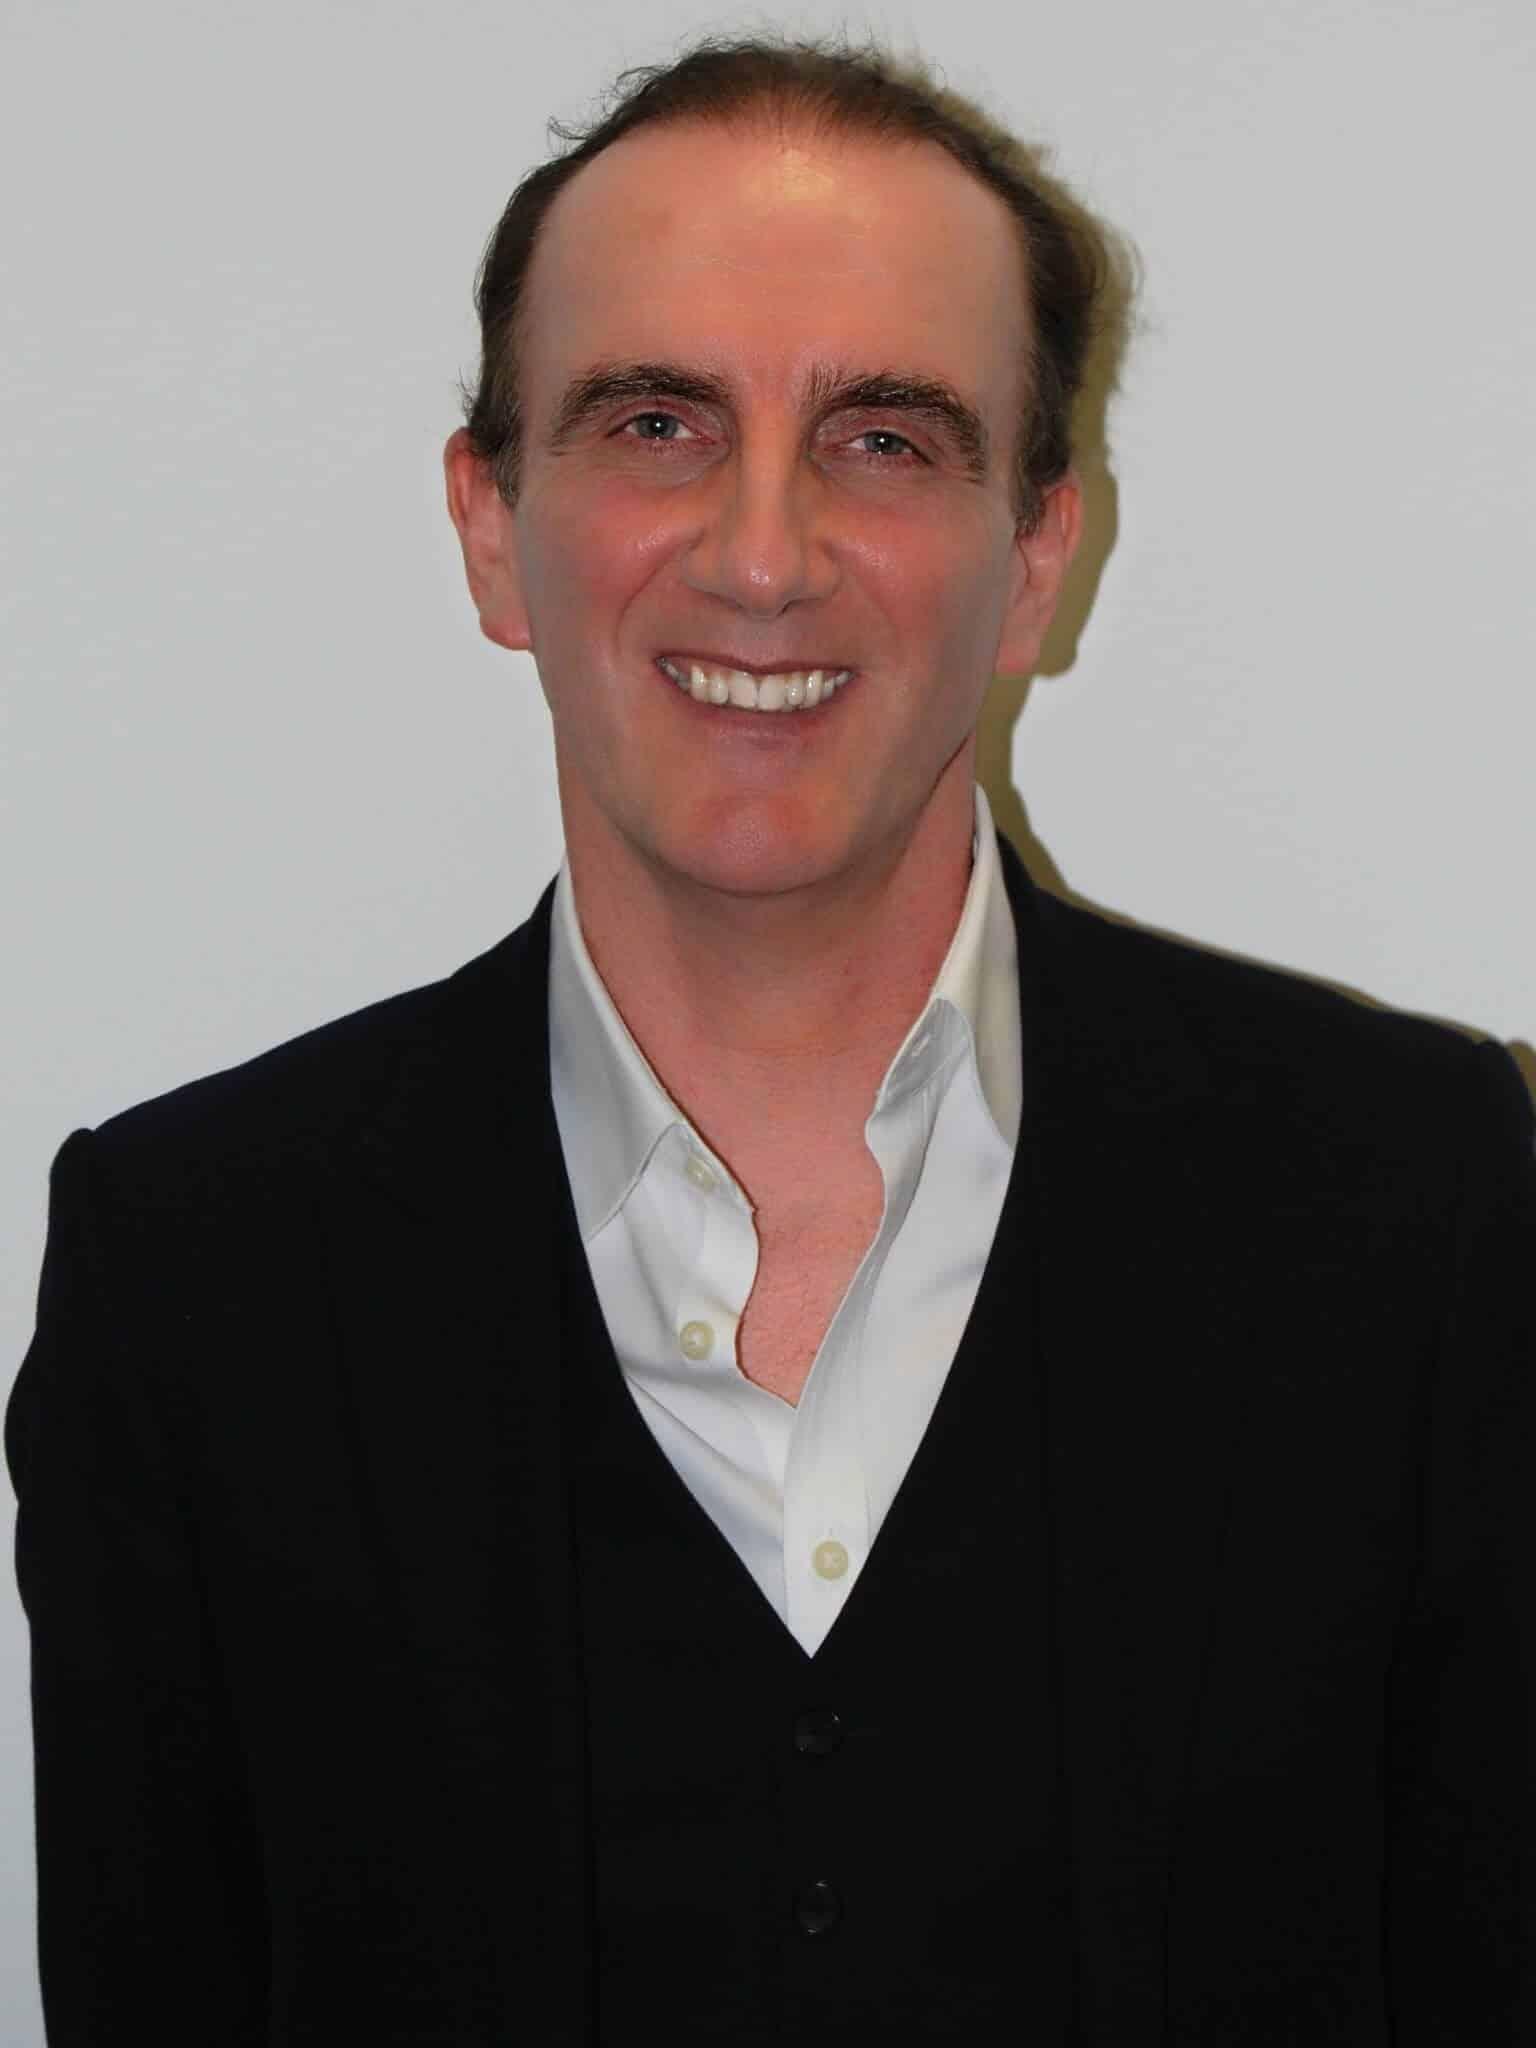 Henry Croydon of Micro Insurance Company